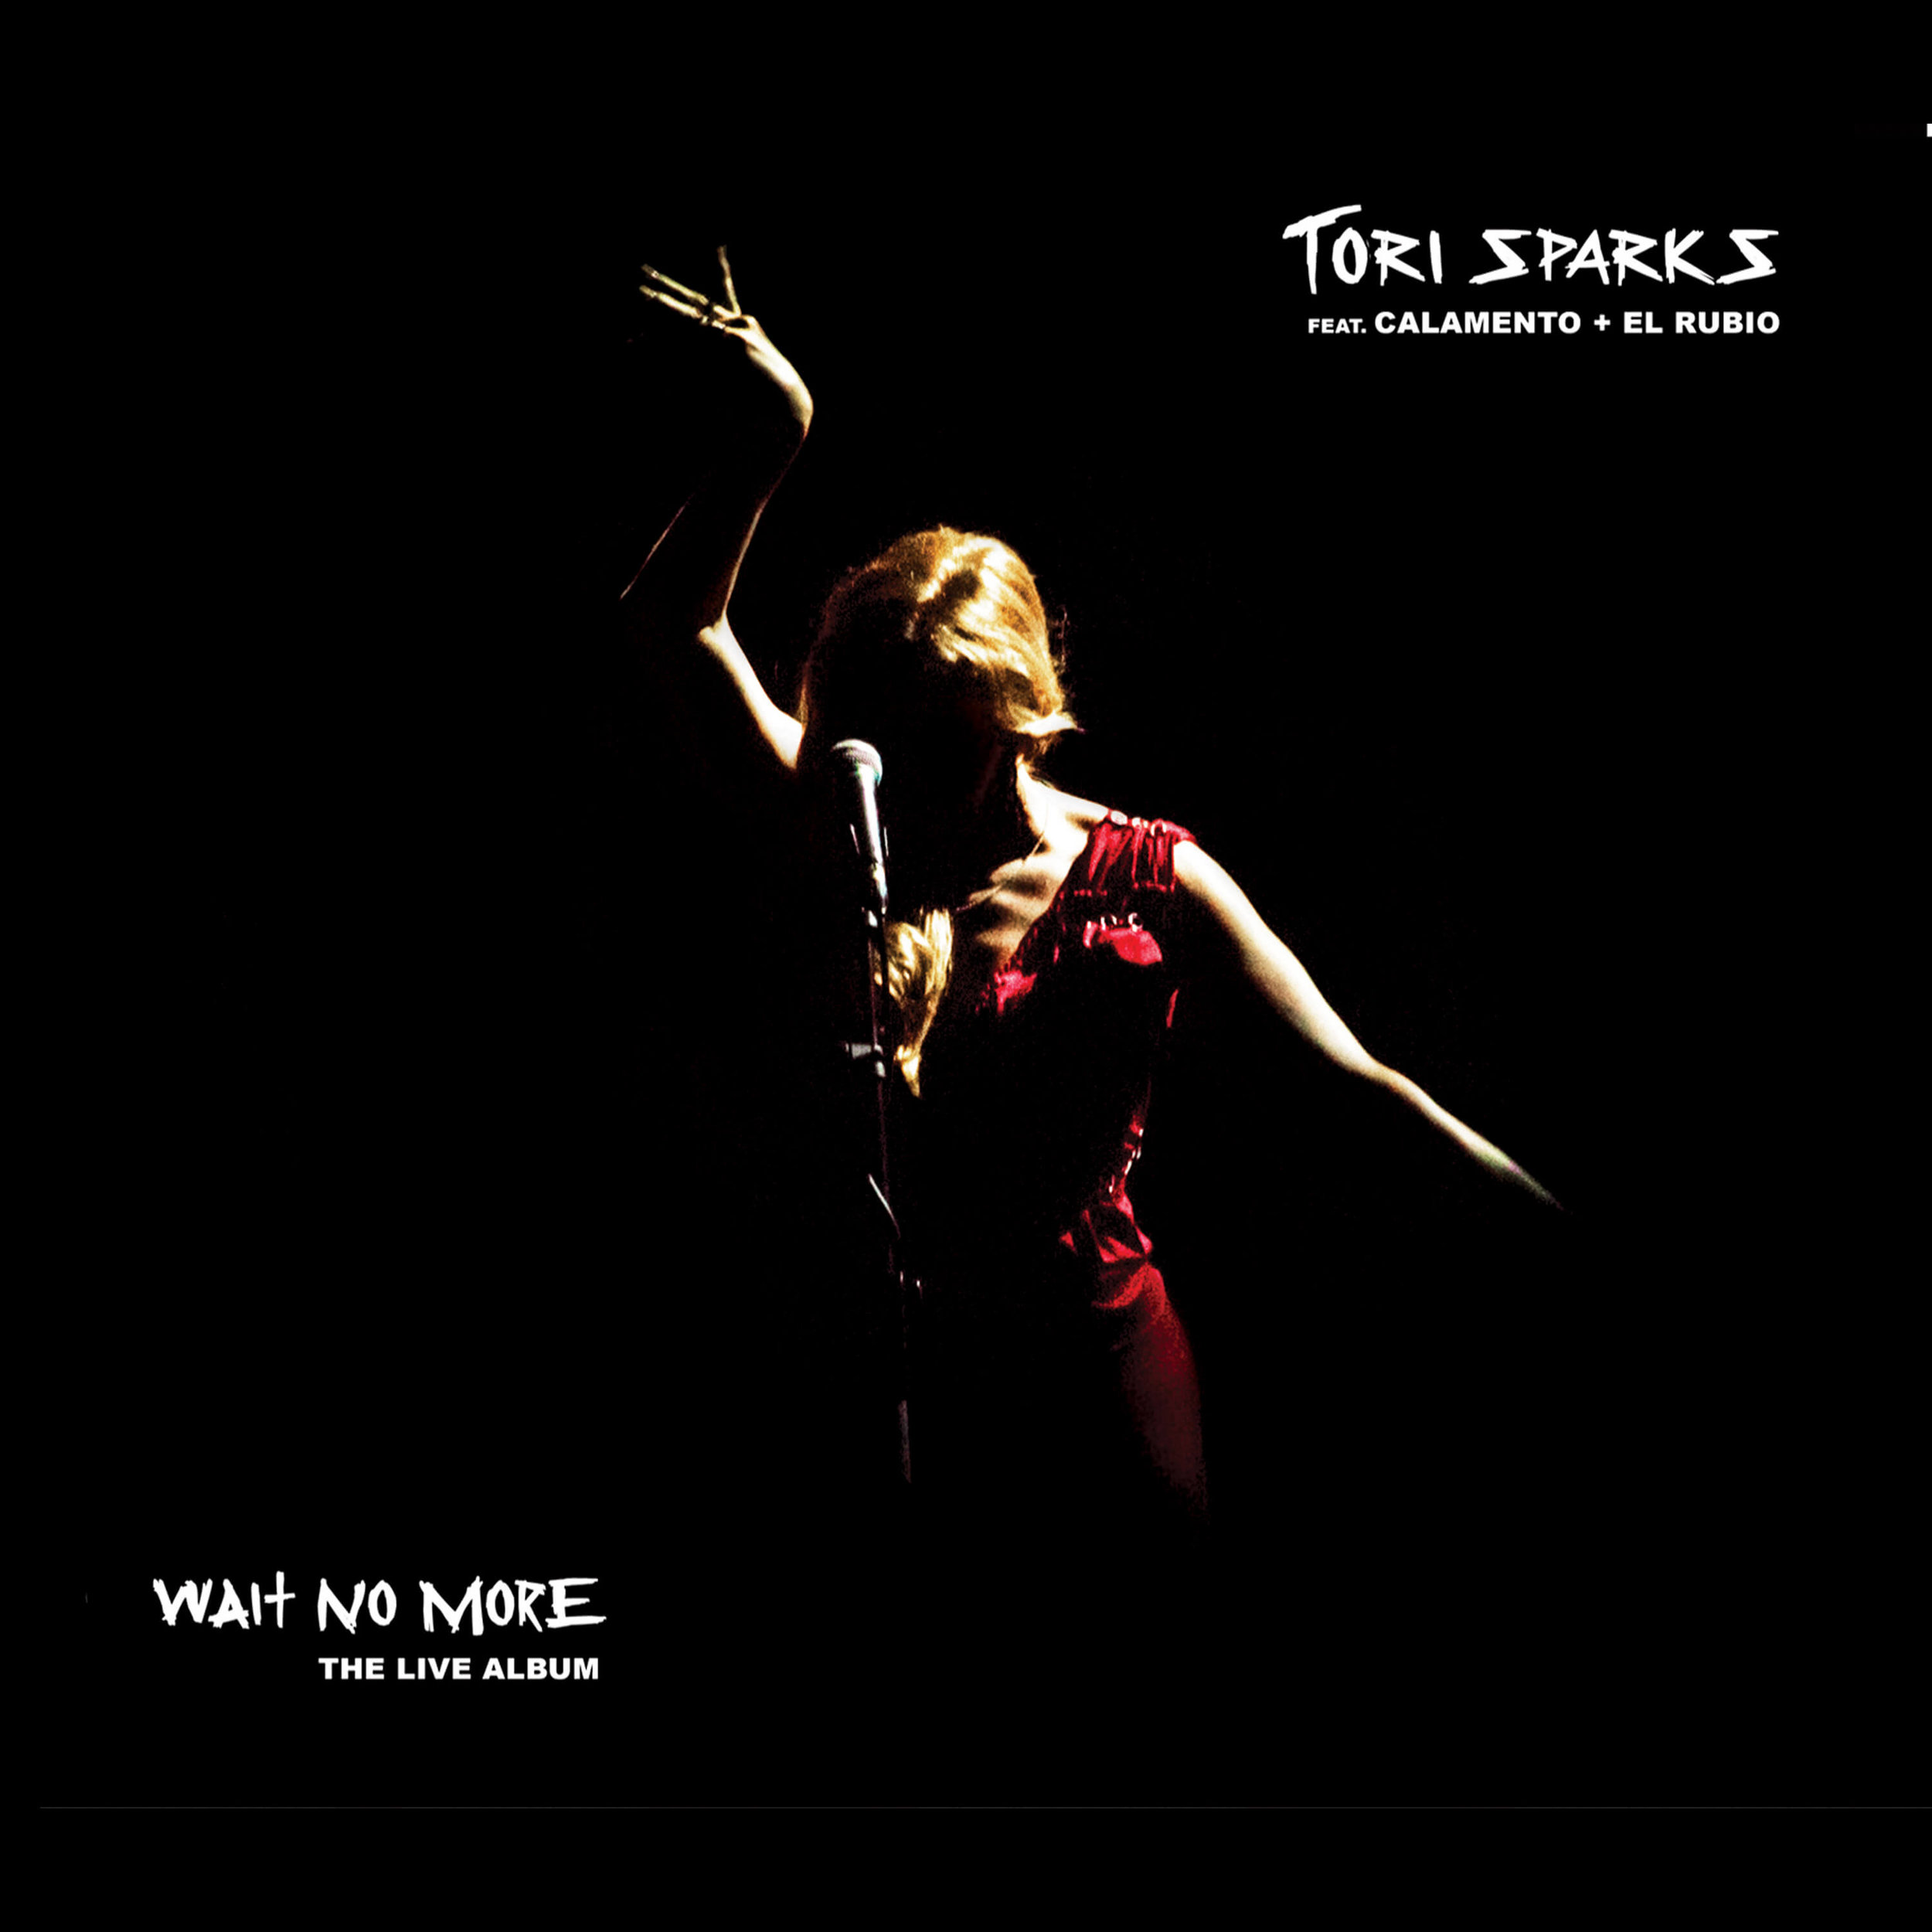 Tori Sparks - Wait No More: The Live Album - Cover Photo by Alexey Stradubanov